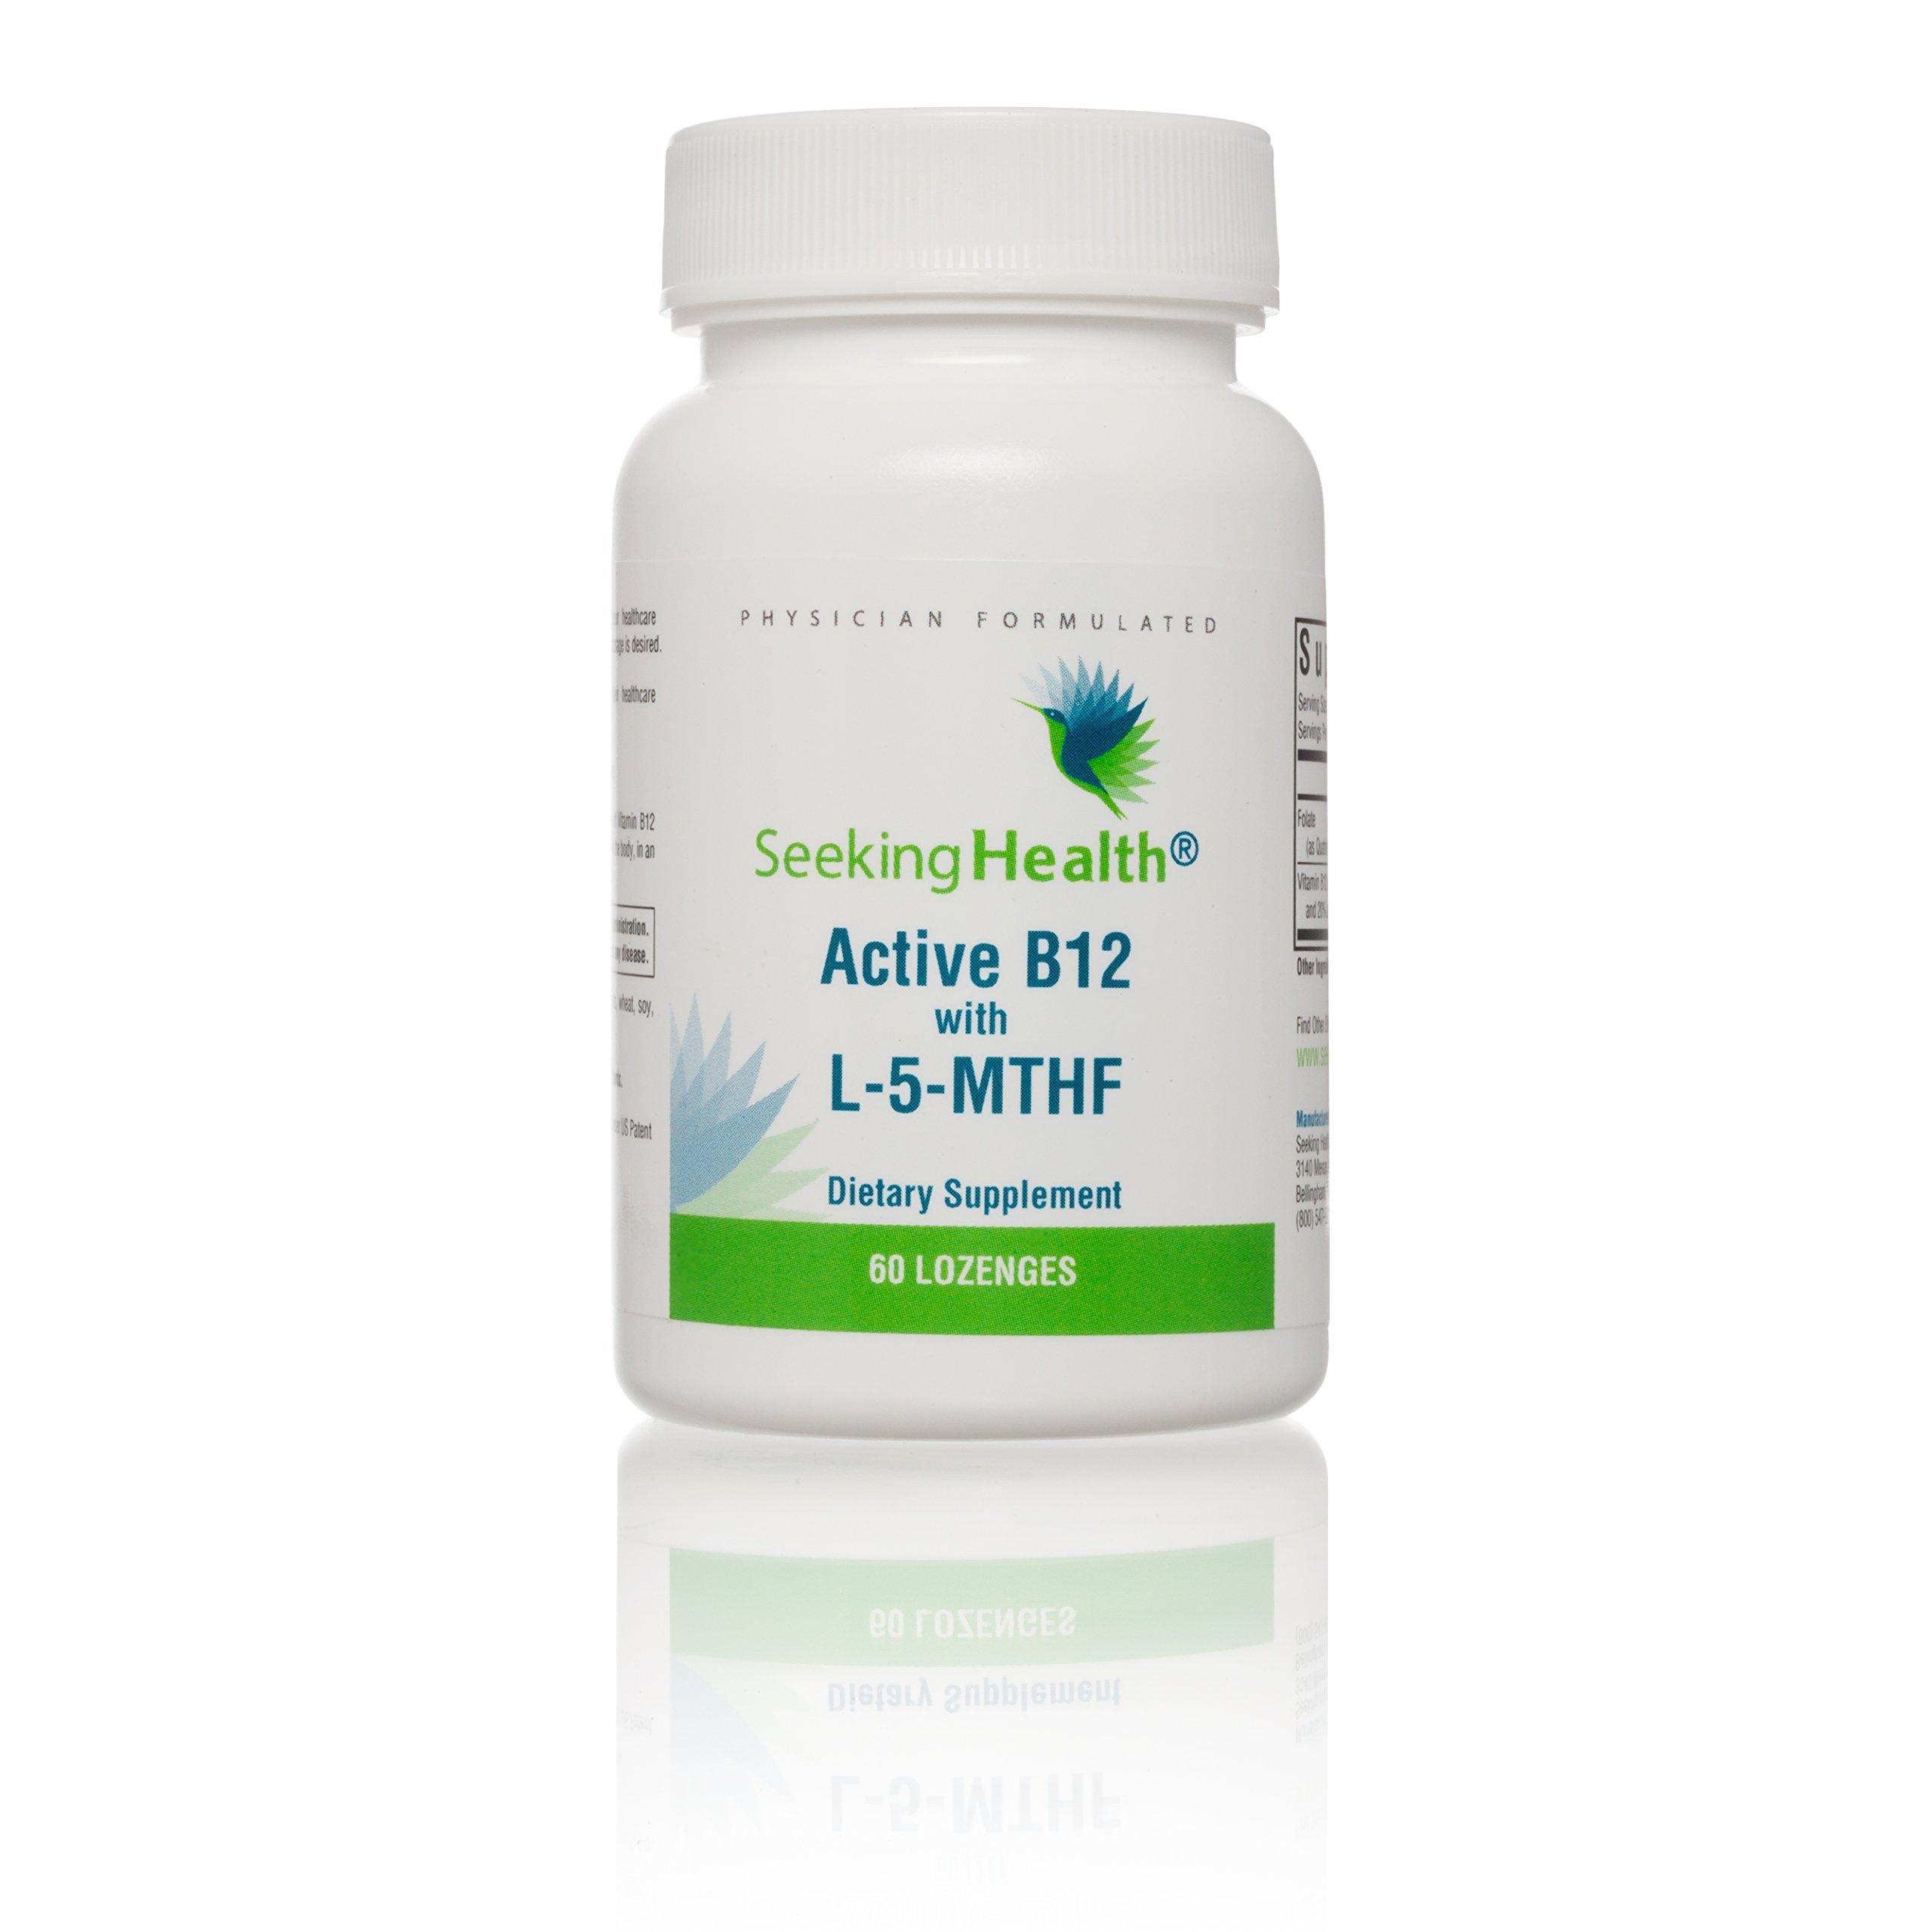 Seeking Health | Active B12 Lozenge with L-5 MTHF | Vitamin B12 Supplement | Methylfolate | 60 Lozenges by Seeking Health